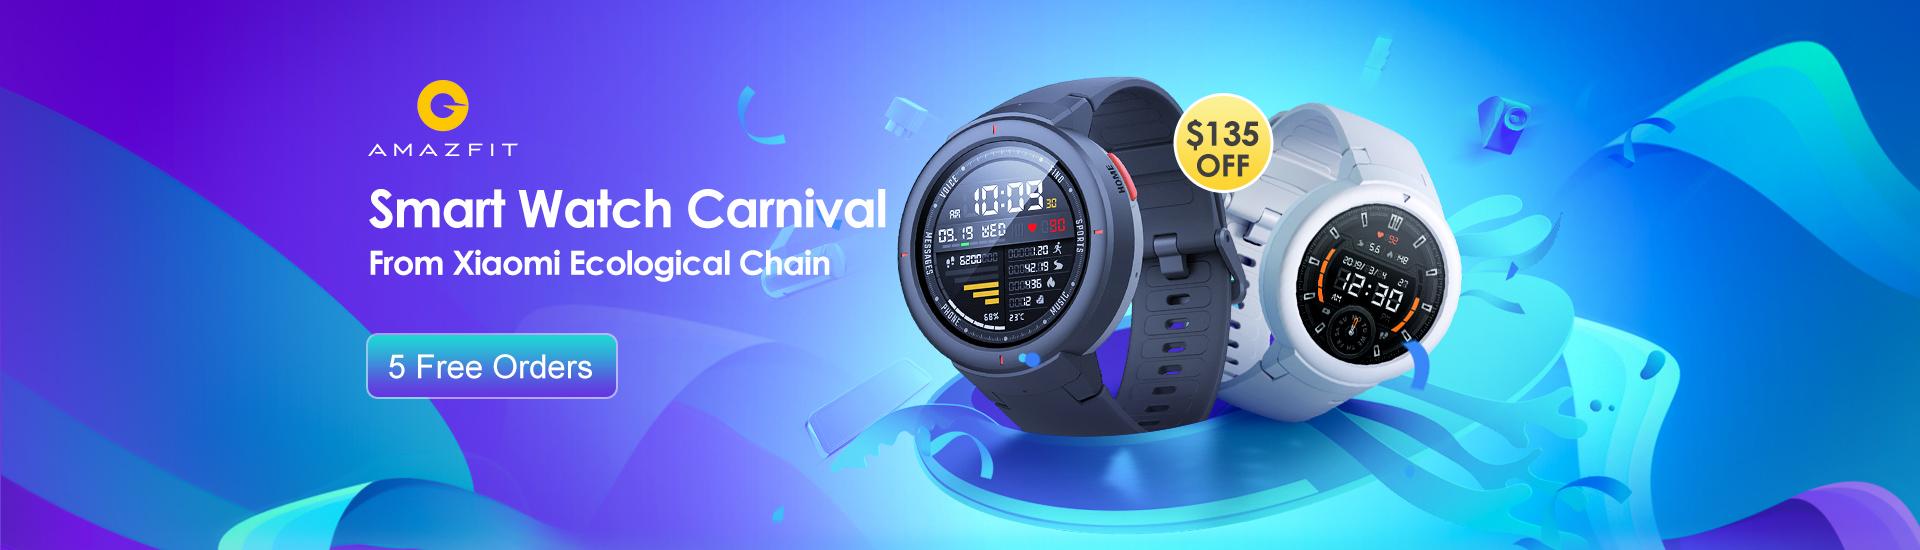 Amazfit Smart Watch Carnival на Banggood